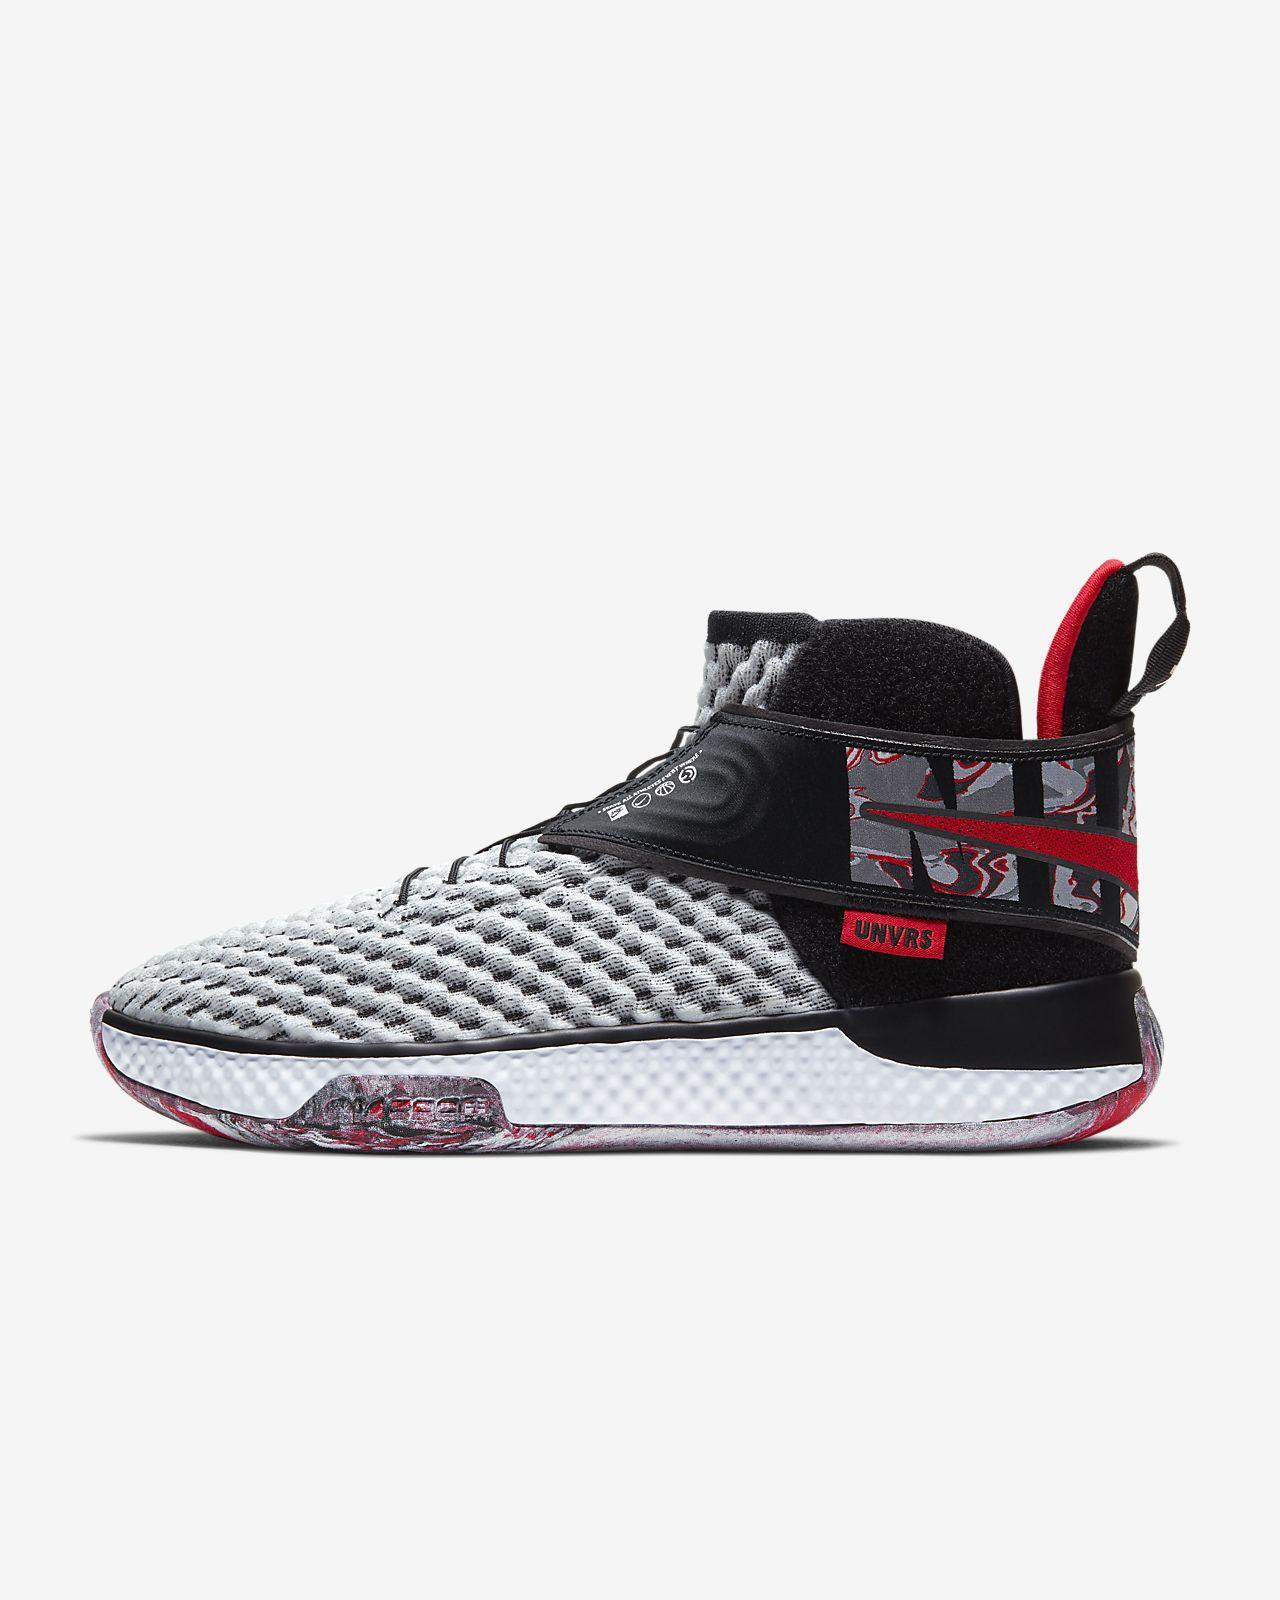 Chaussure de basketball Nike Air Zoom UNVRS Flyease